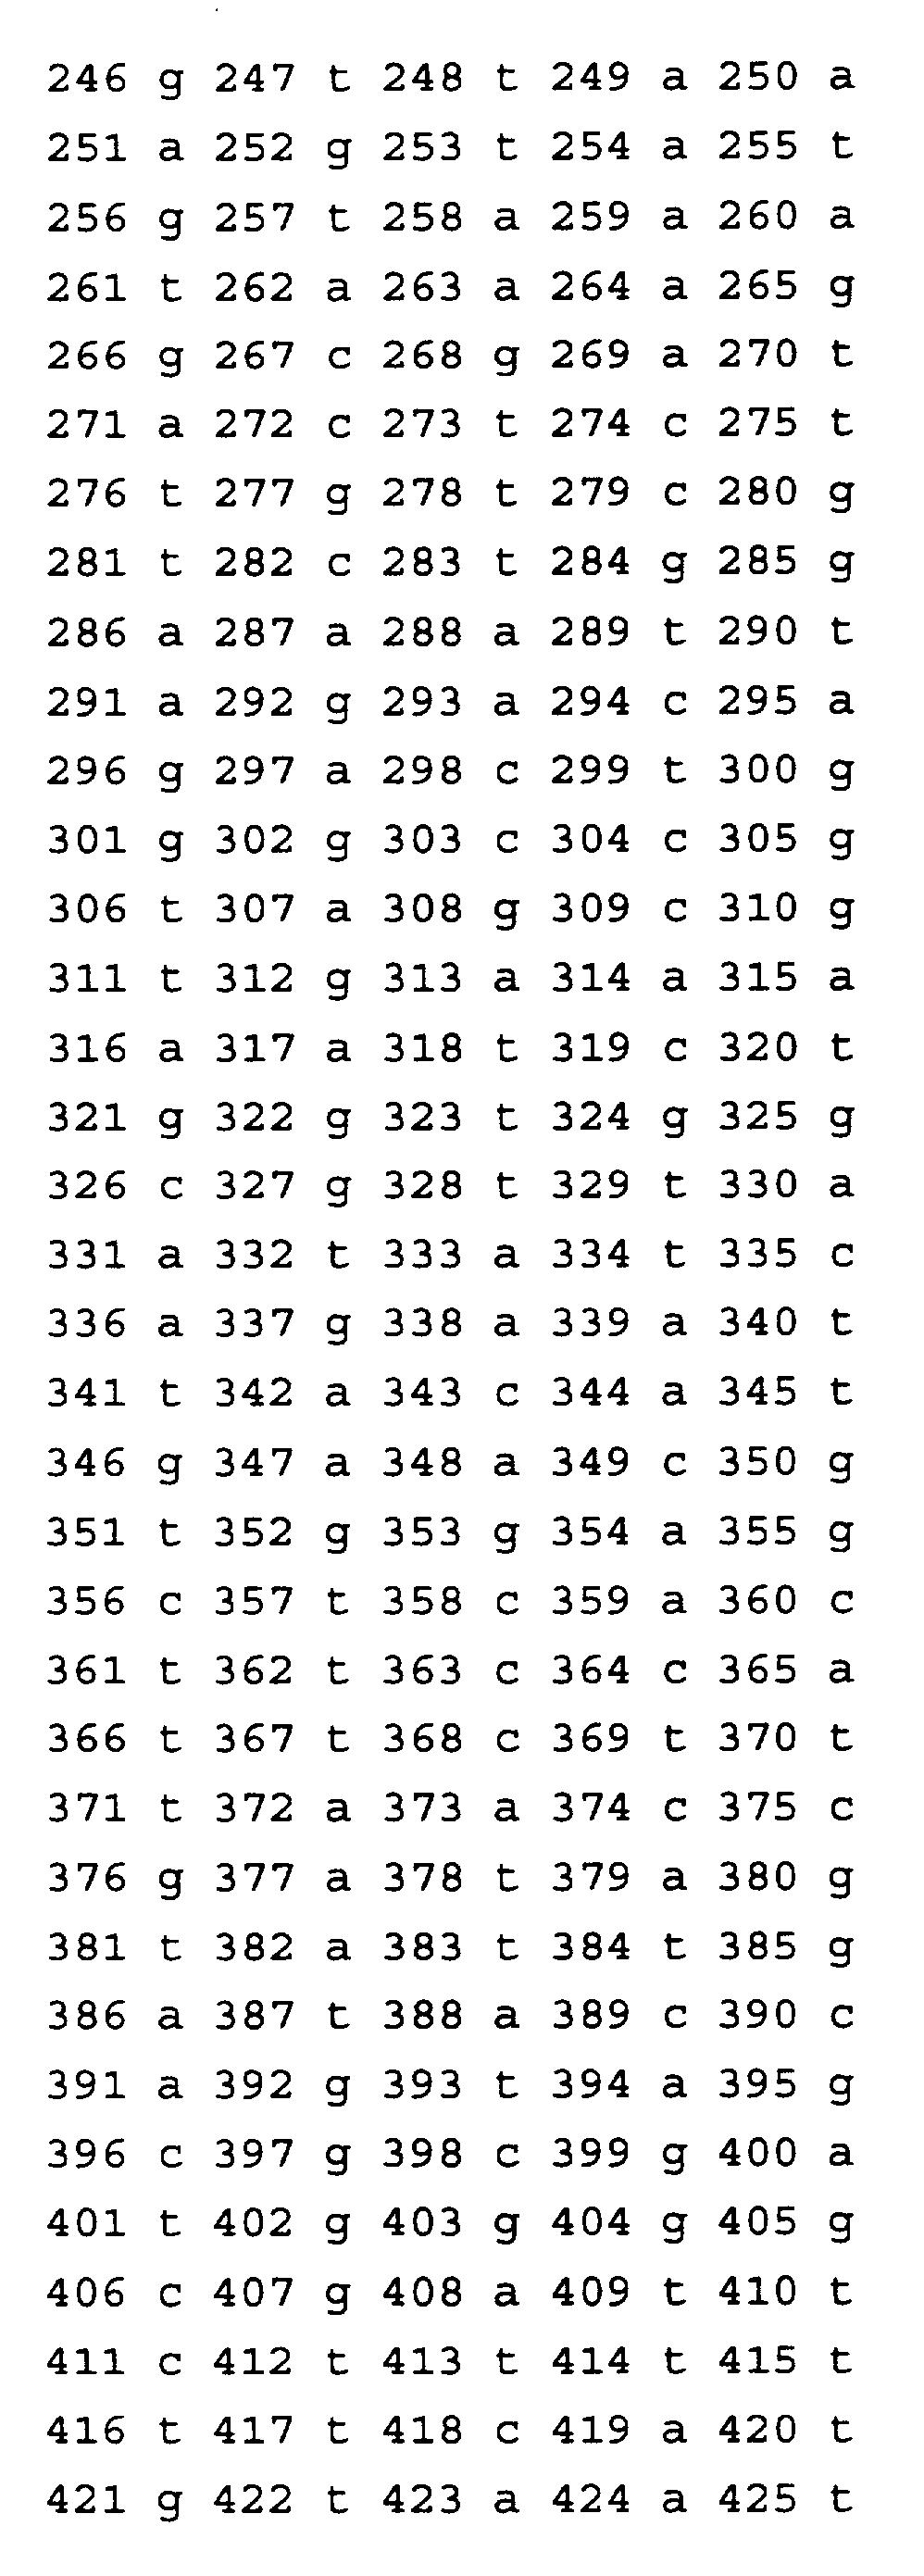 WO1997001146A9 - Computational analysis of nucleic acid ...